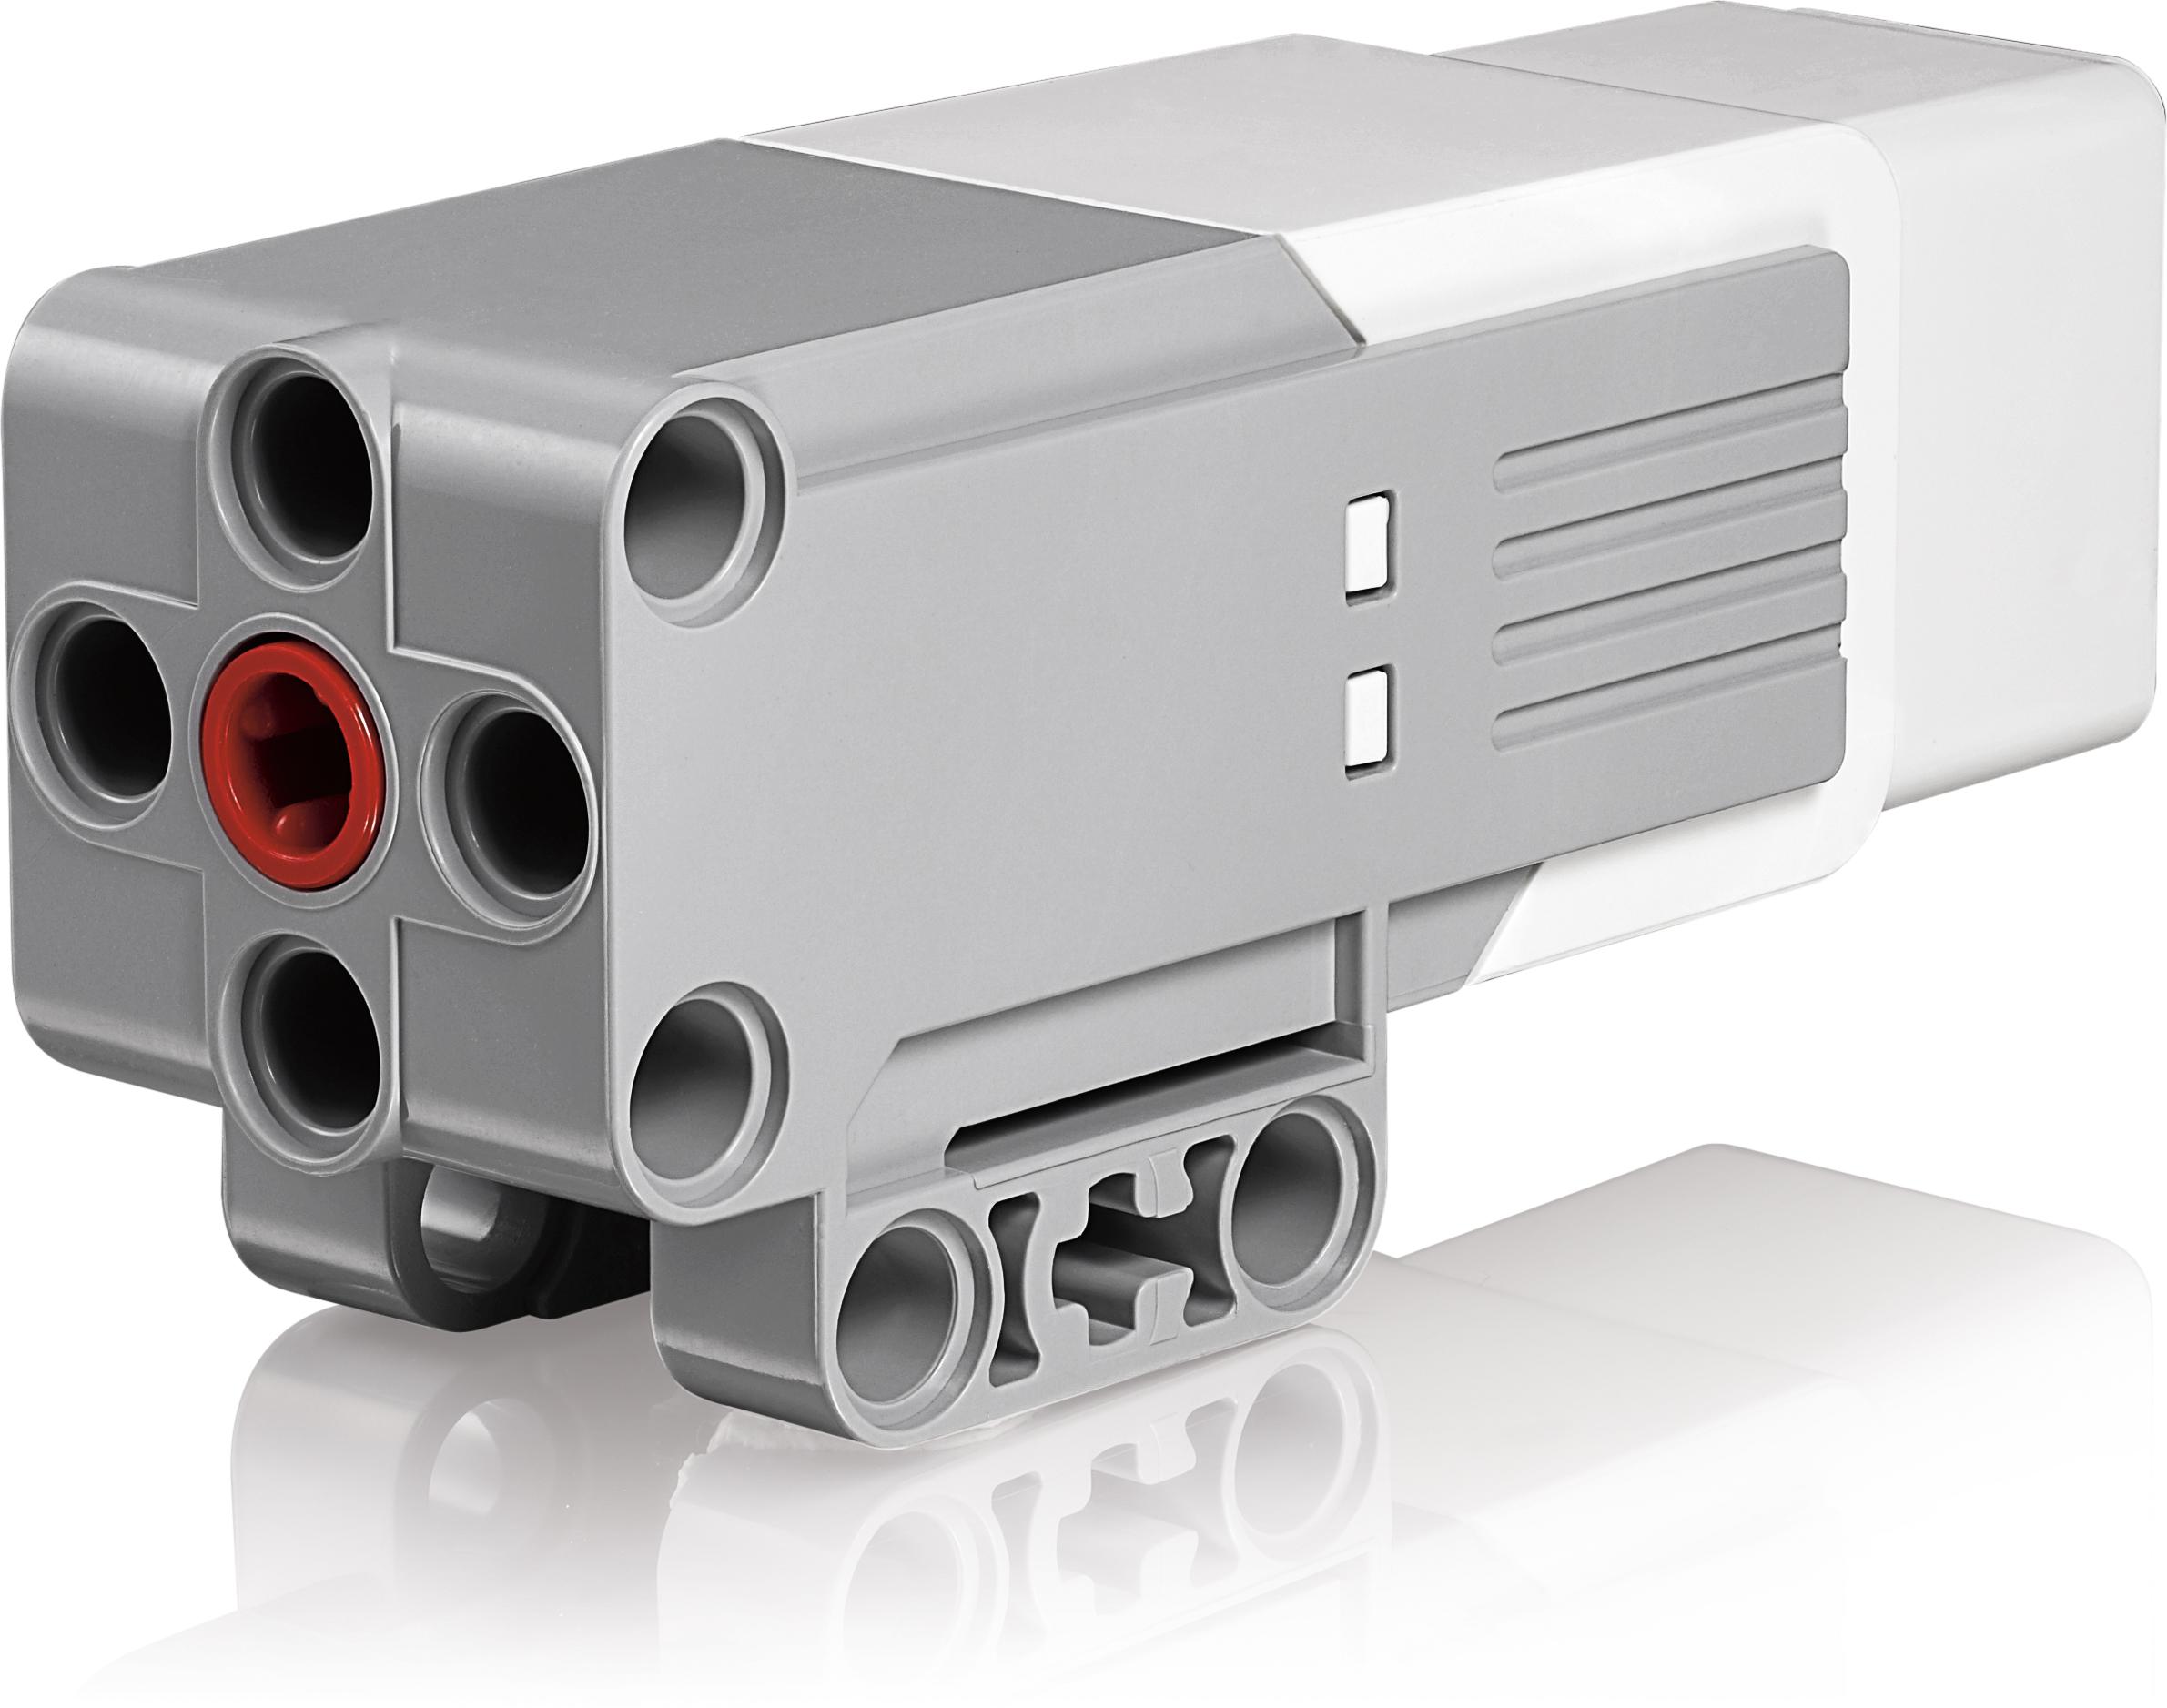 Lego Mindstorms EV3: Neue Roboterplattform von Lego - Lego Mindstorms EV3: Motor